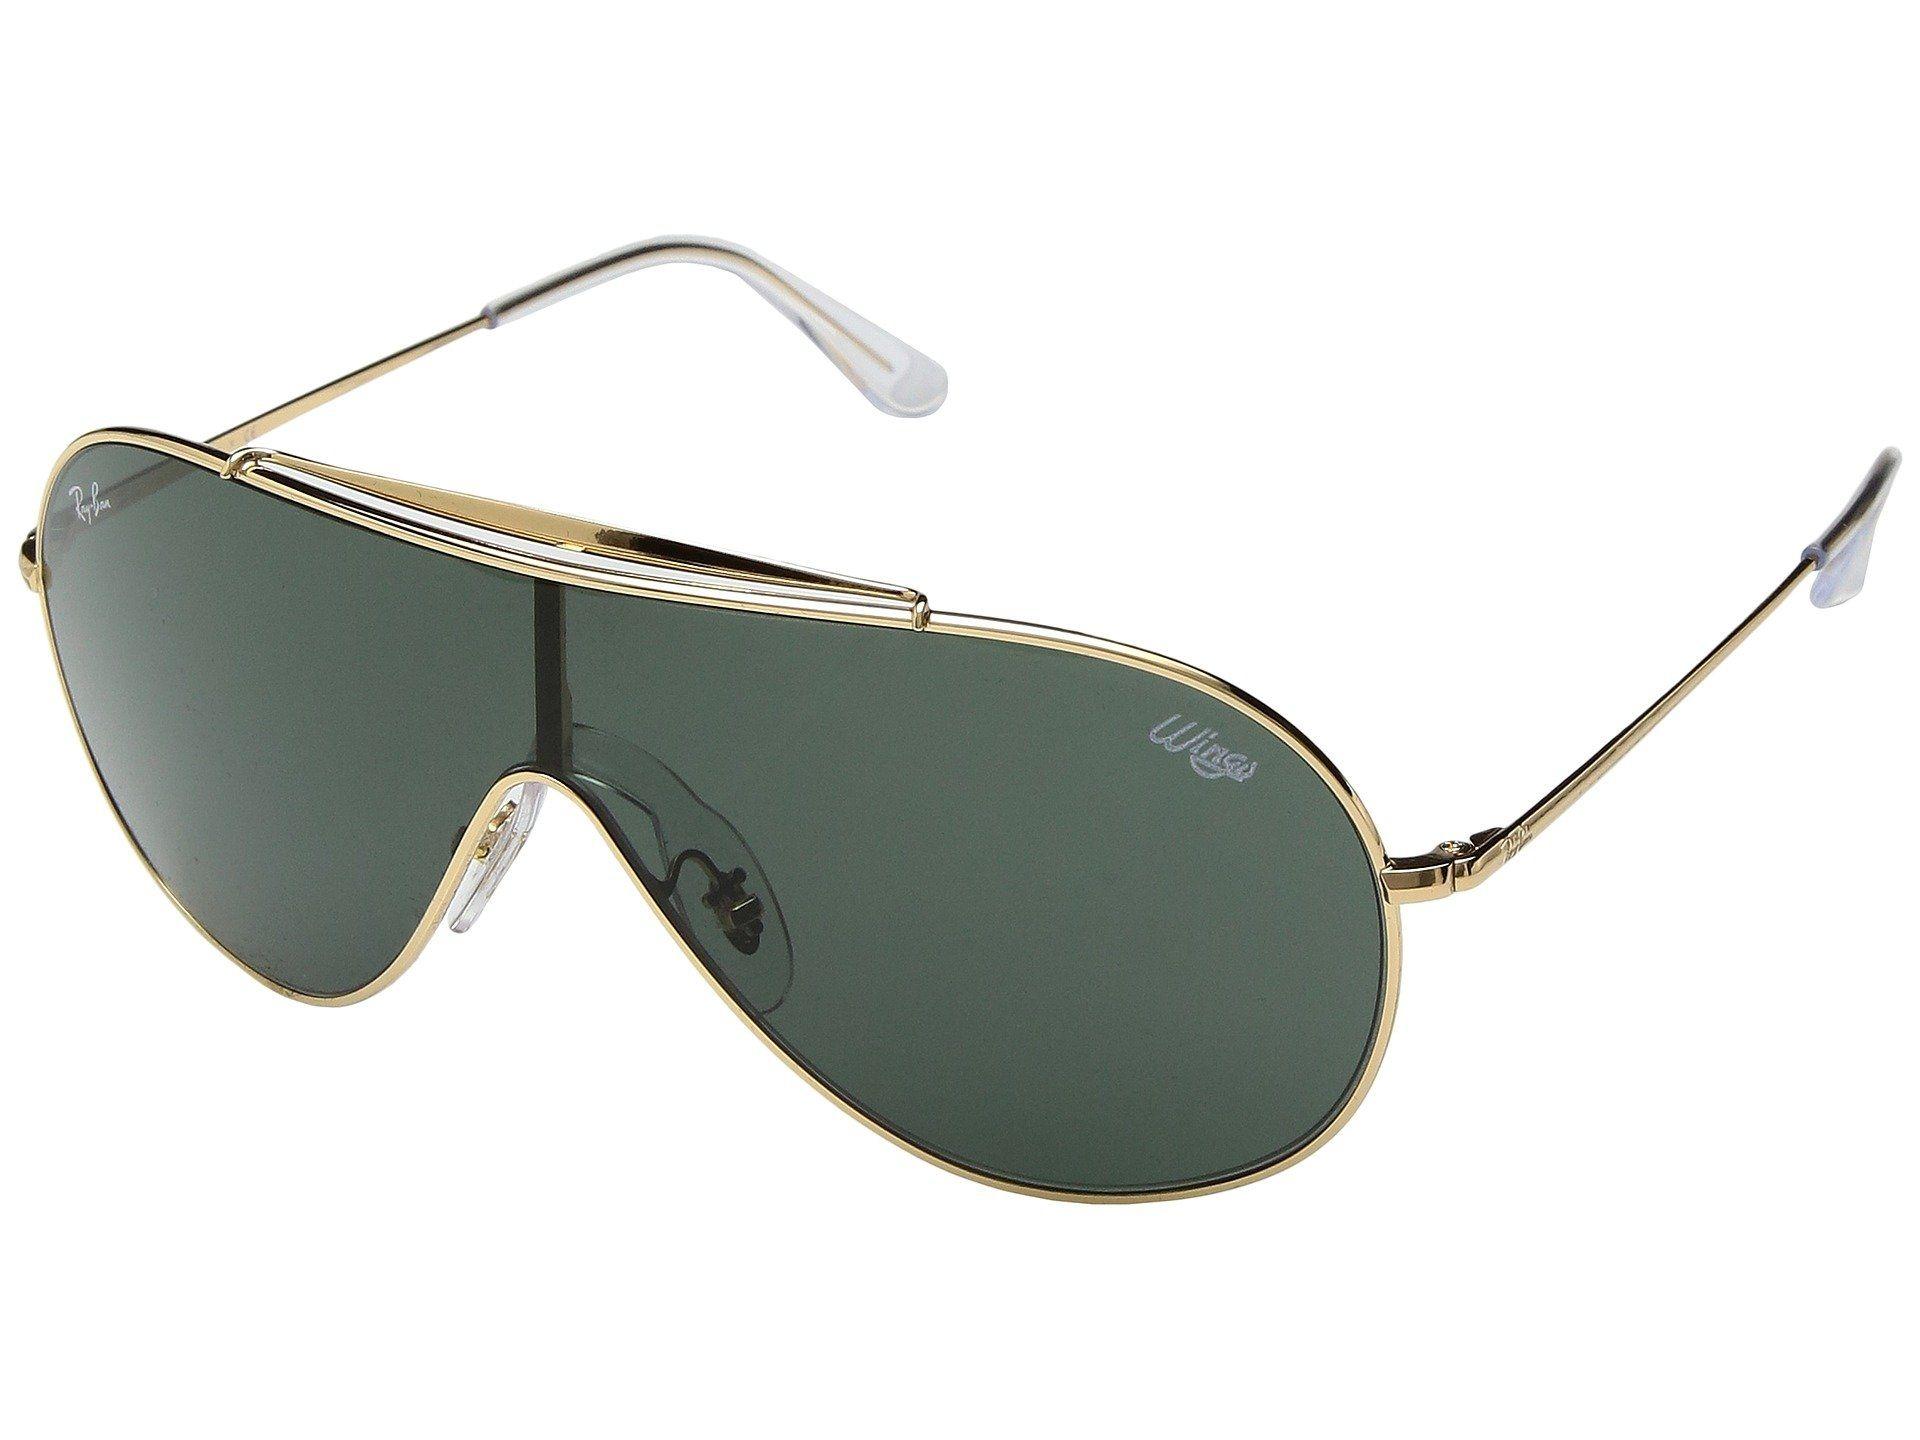 998eb674bb767 Ray-Ban 4237 601, 30 50 Round Sunglasses For Unisex-Black ...